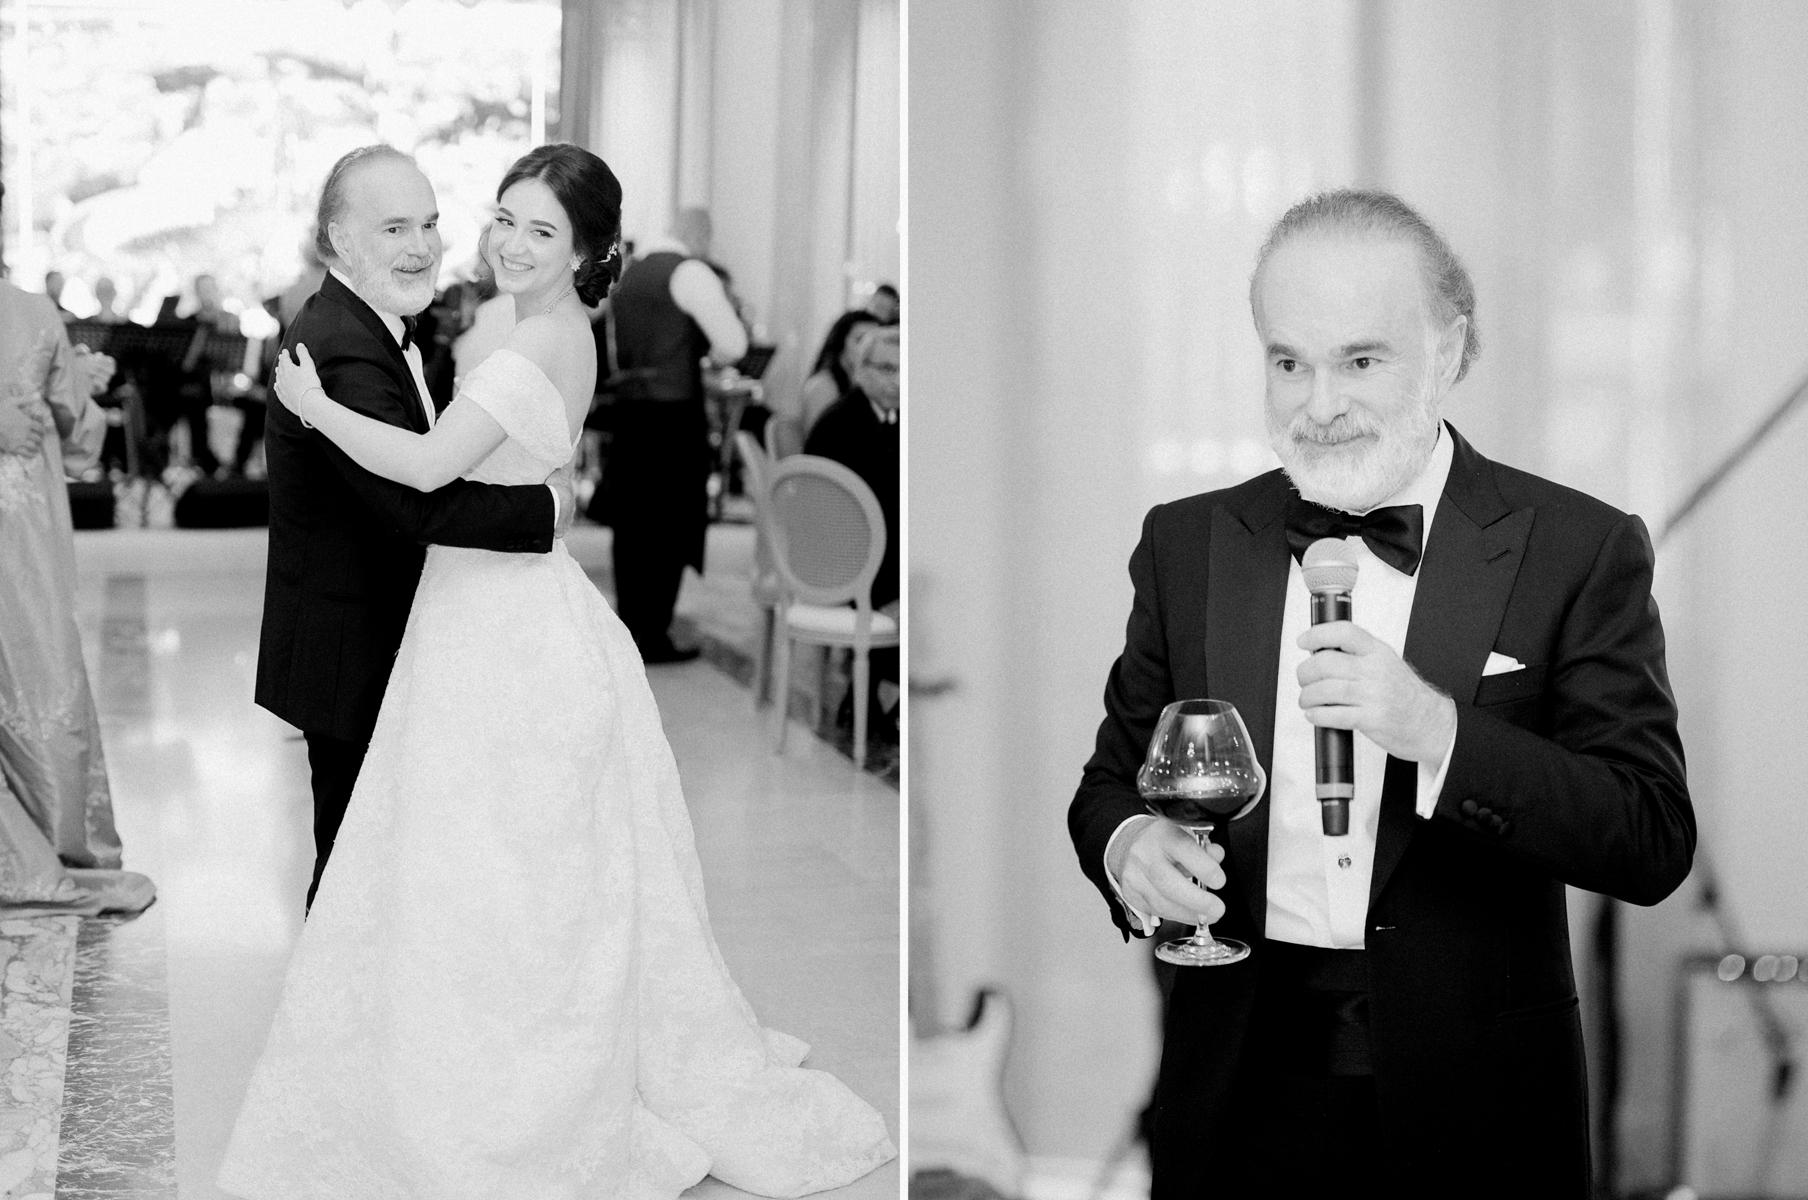 Palace_Villa_Cortine_Hotel_Italian_Wedding_Photographer_Sirmione_AKP-44-Худоян_Альберт.jpg